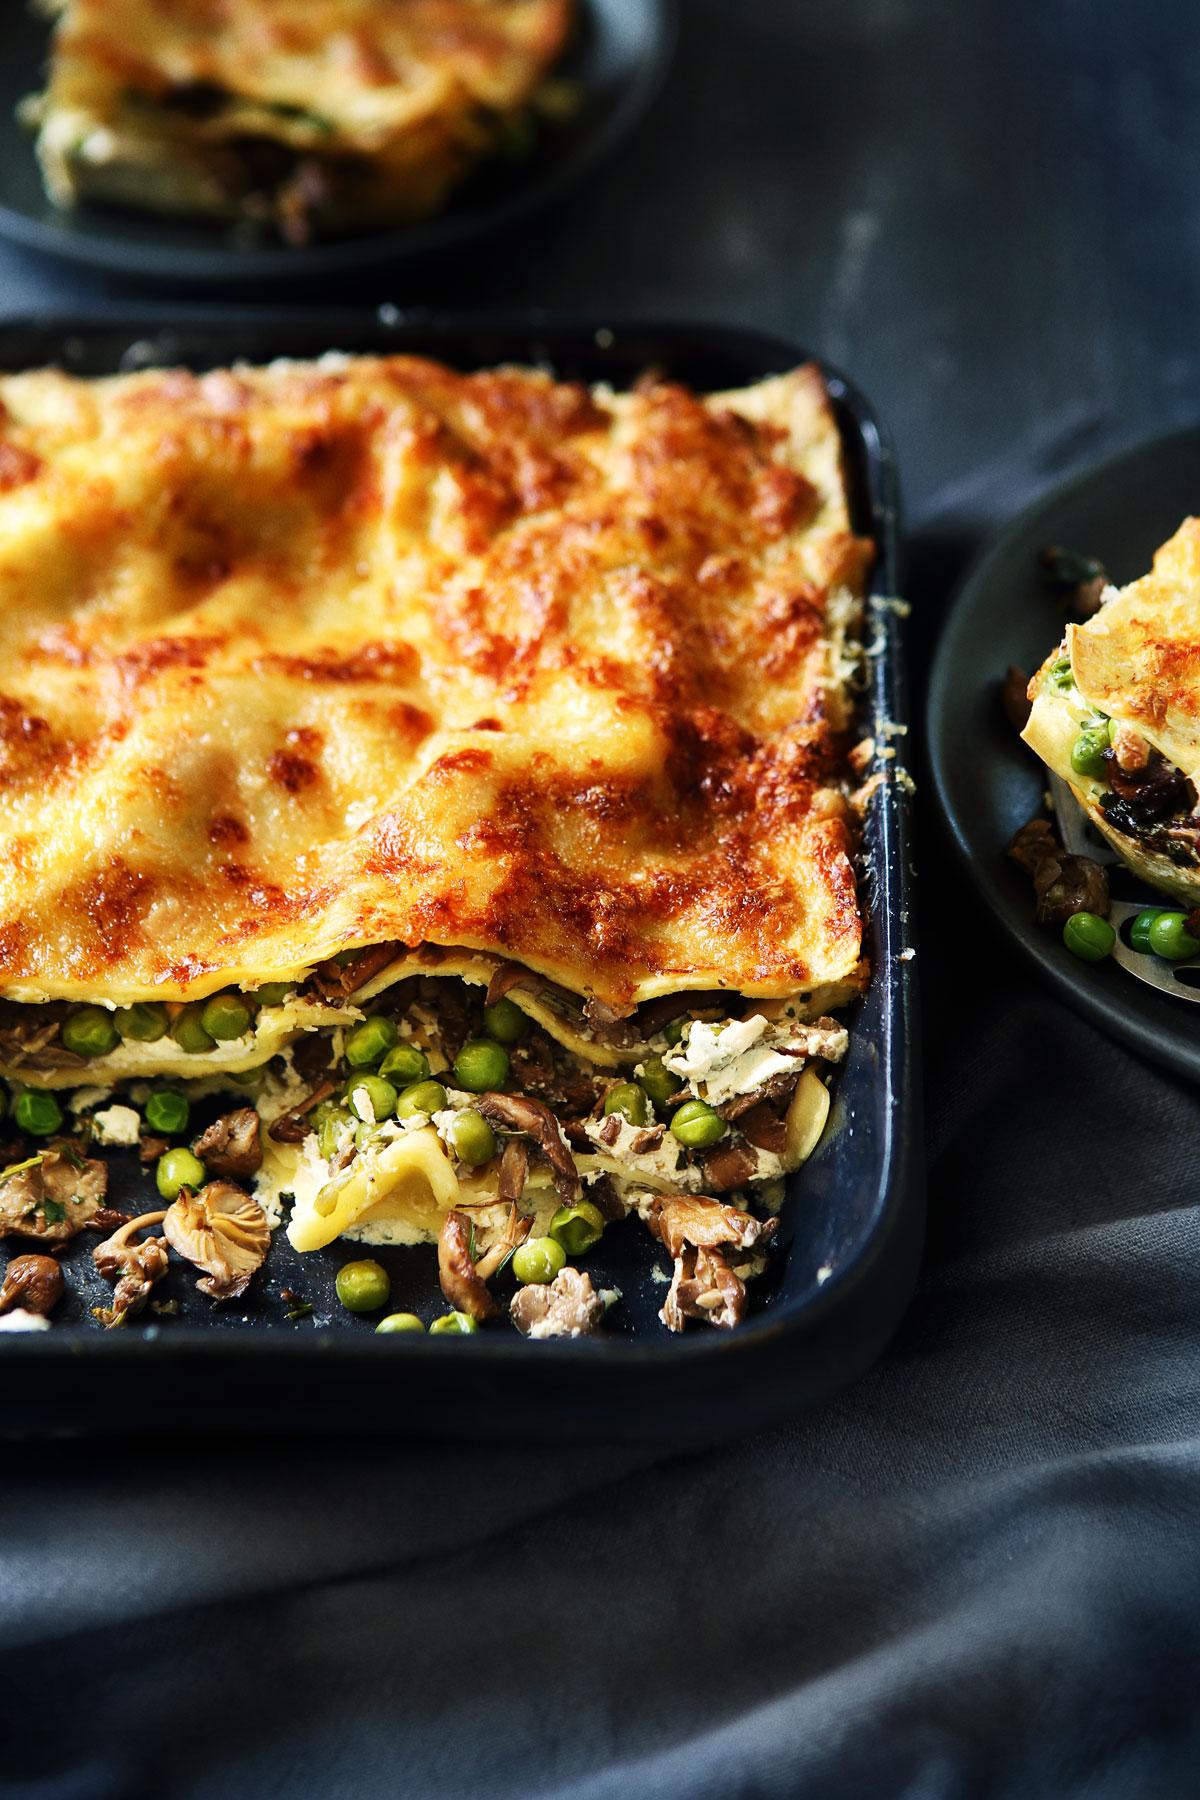 Lasagne Idee Recette.Mes Recettes Vegetariennes Laurent Mariotte